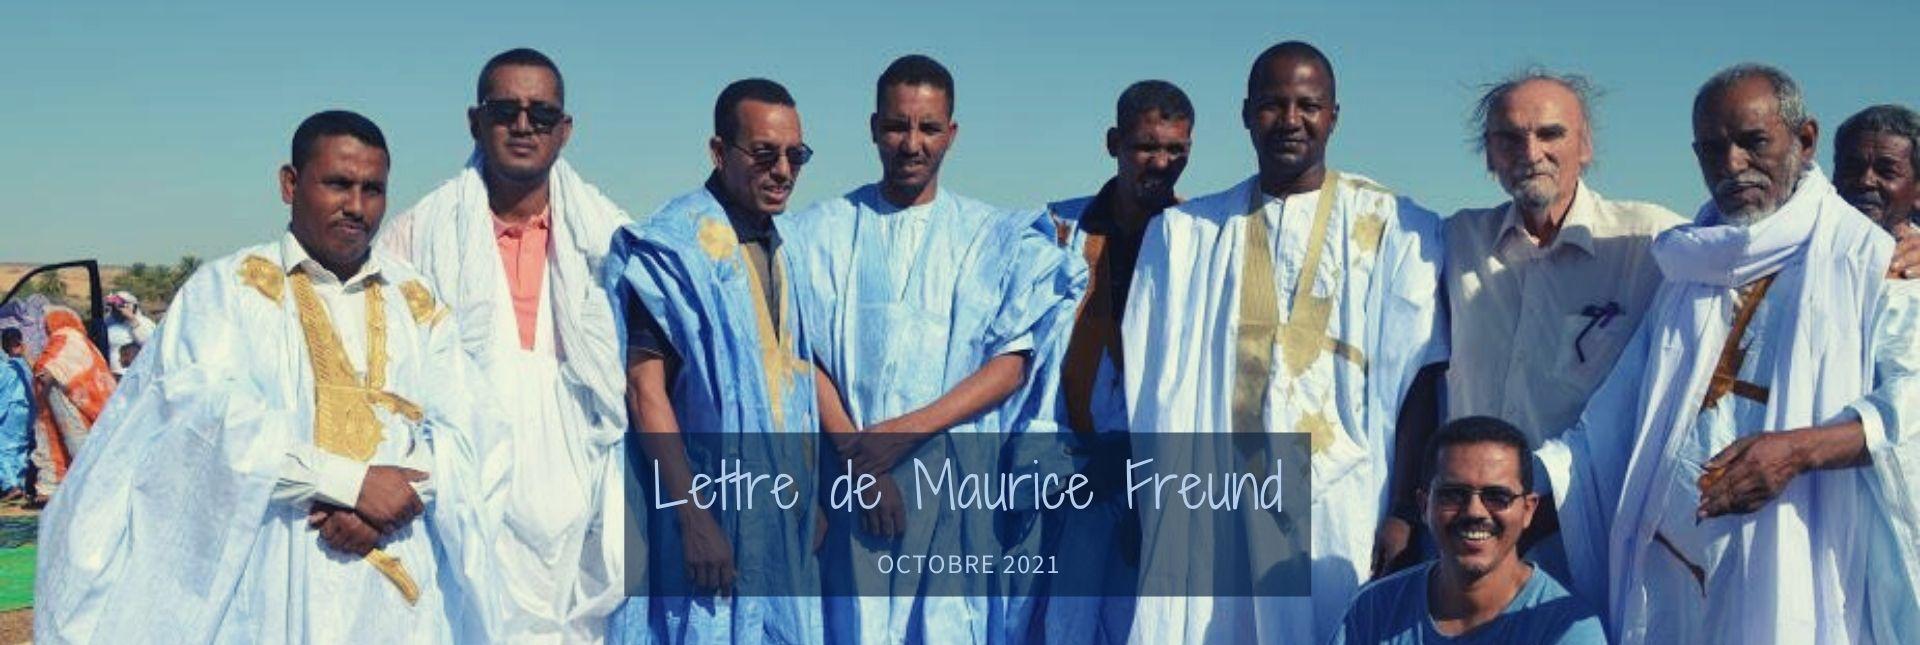 header Lettre de Maurice Freund octobre 2021